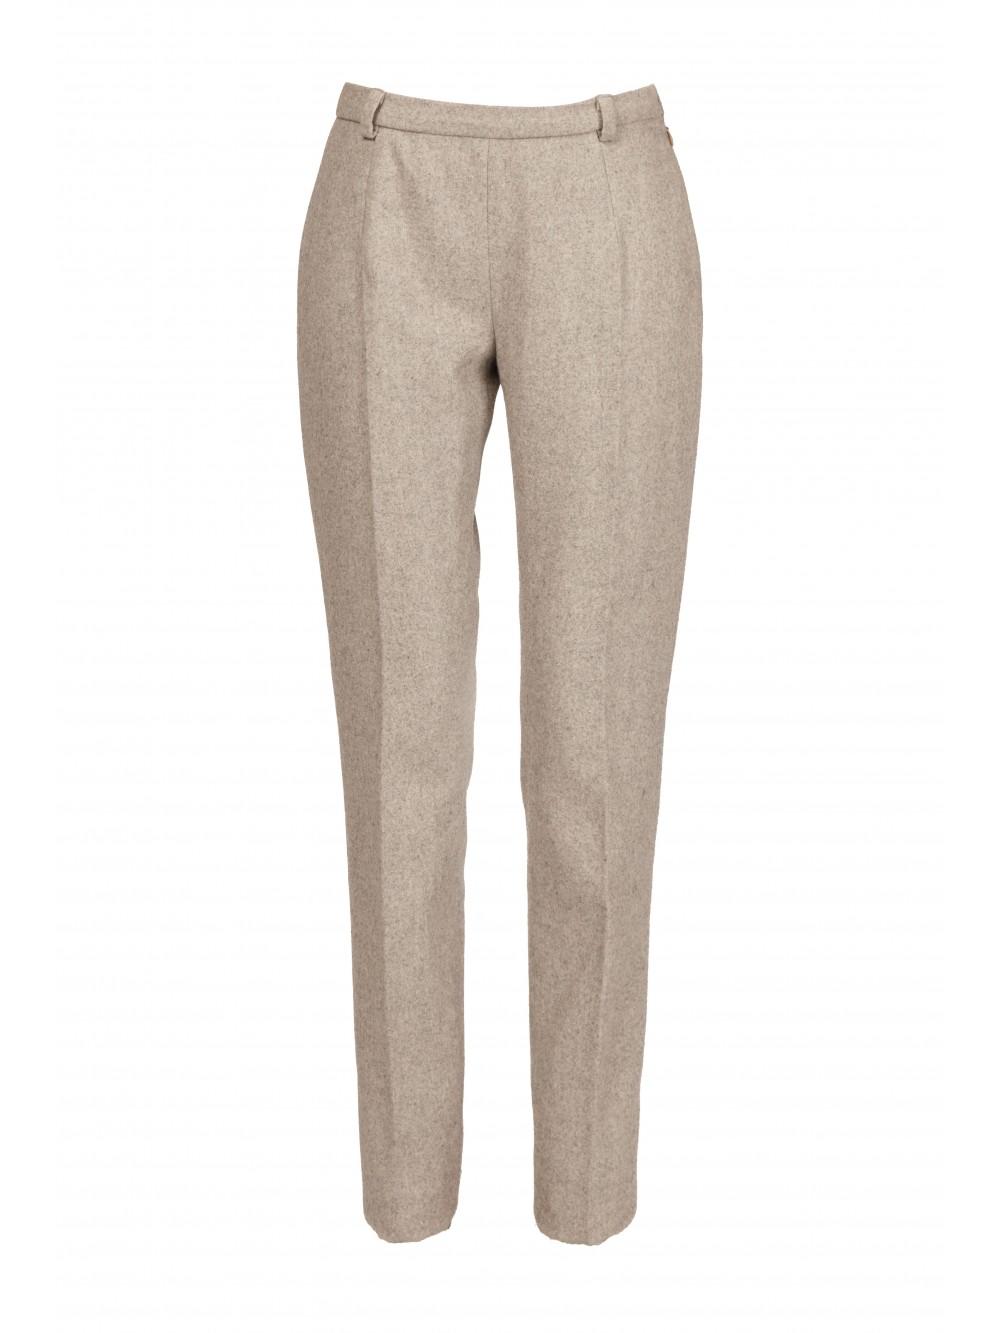 Grey trousers | Rebecca